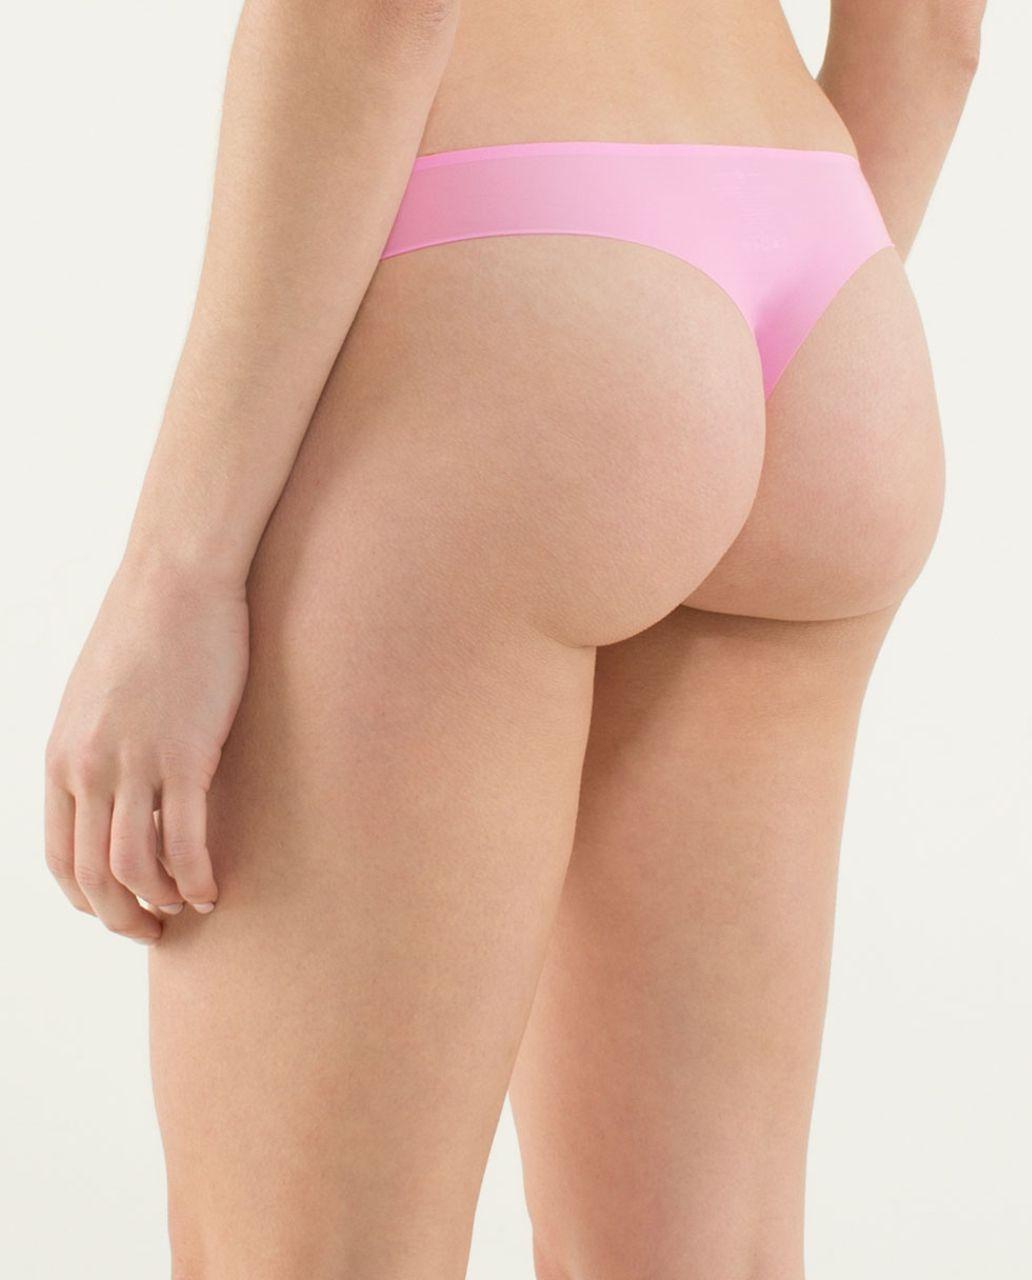 Lululemon Light As Air Thong - Vintage Pink